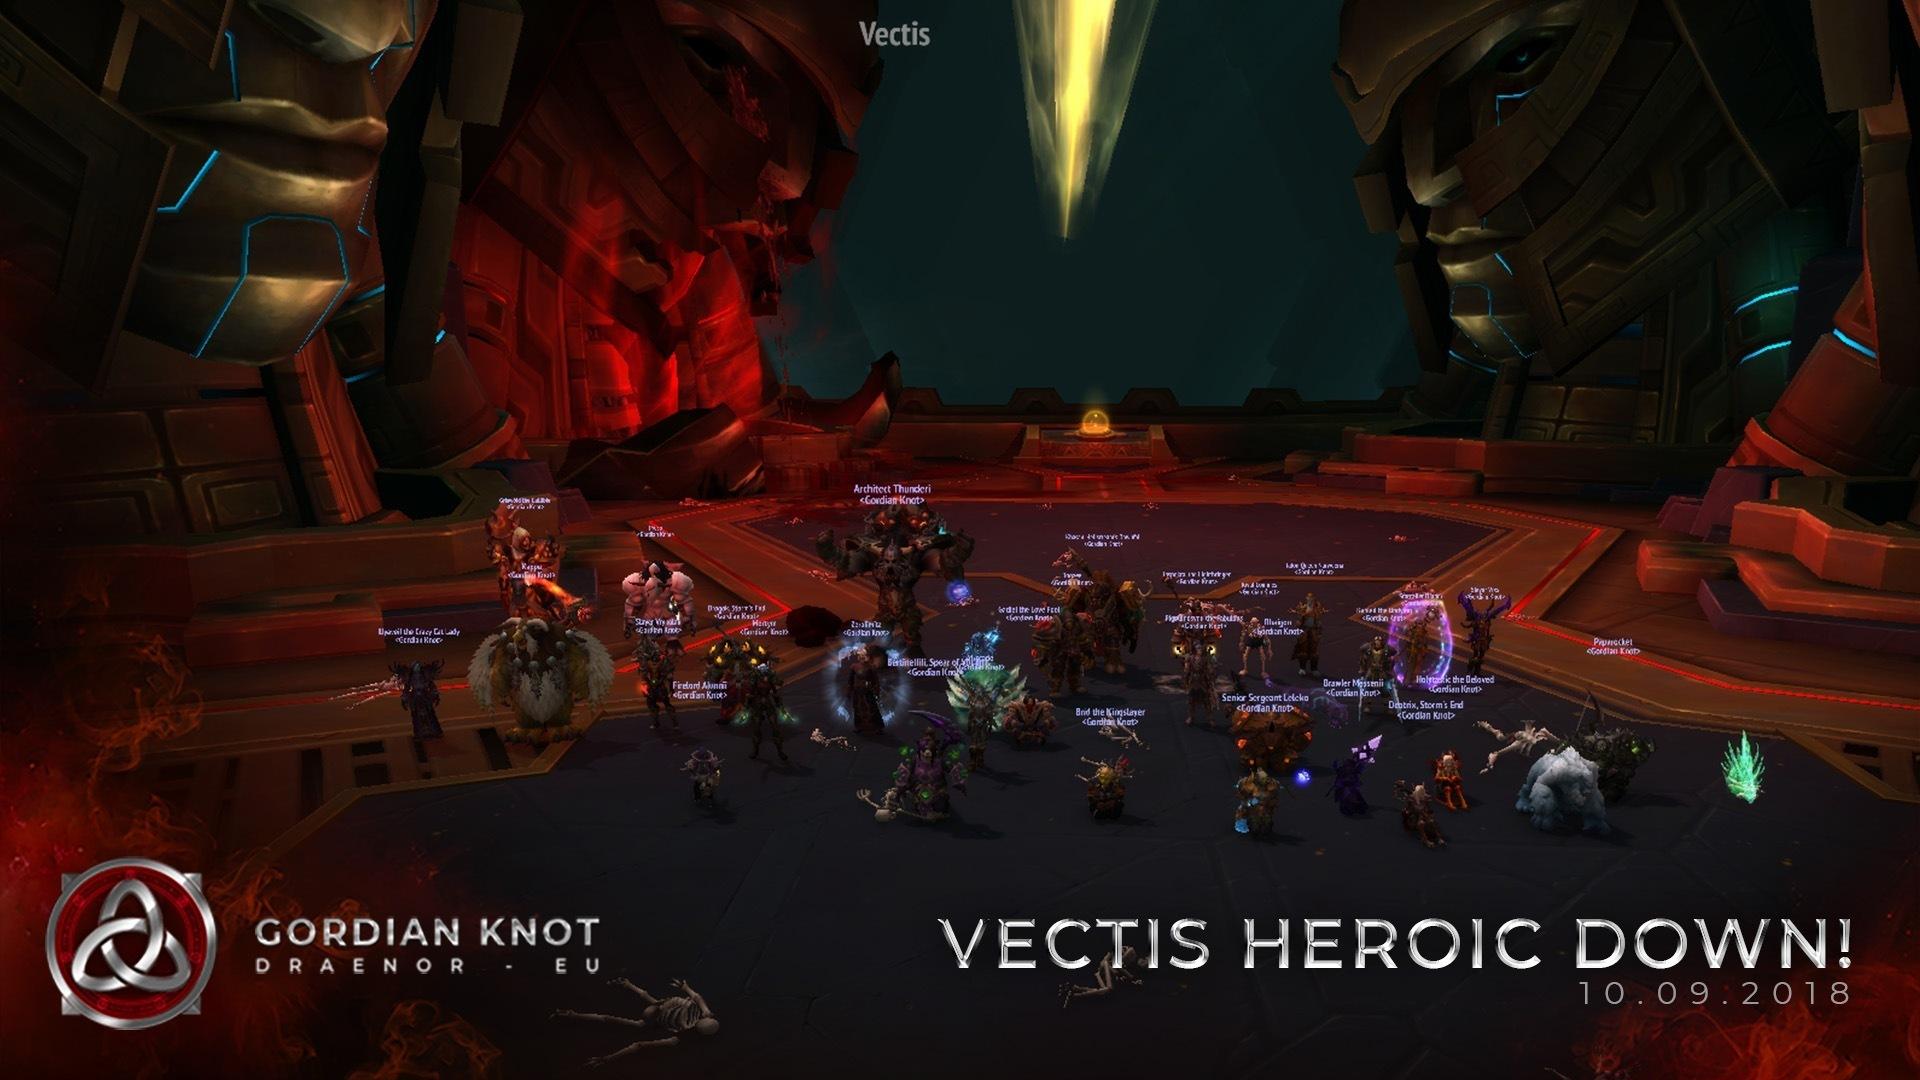 Vectis Heroic